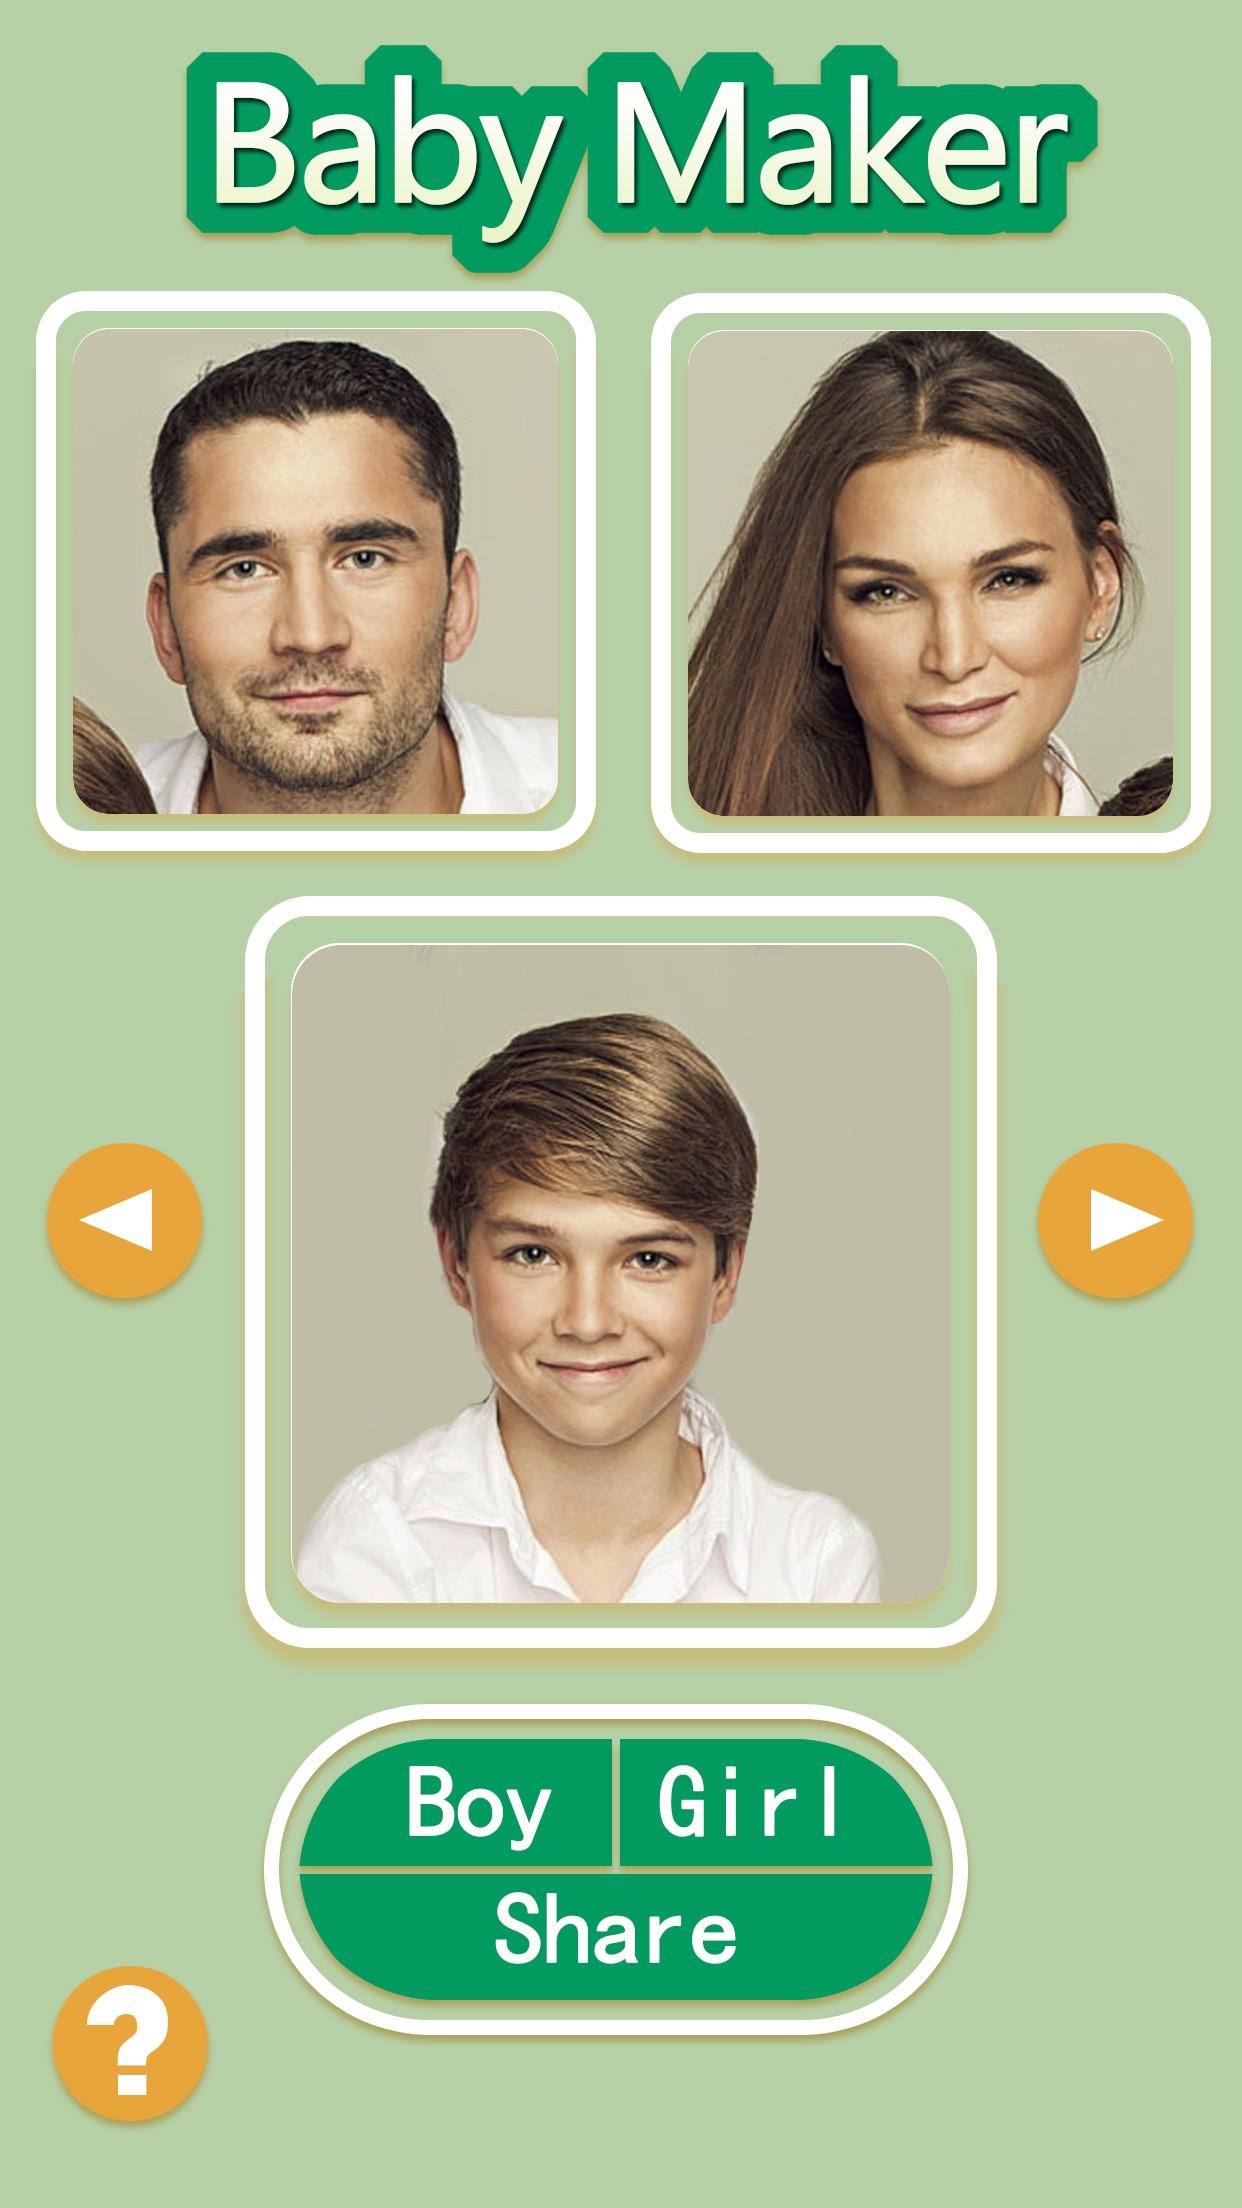 Baby Maker - Face Fusion Editor & Photo Effects Blender Screenshot